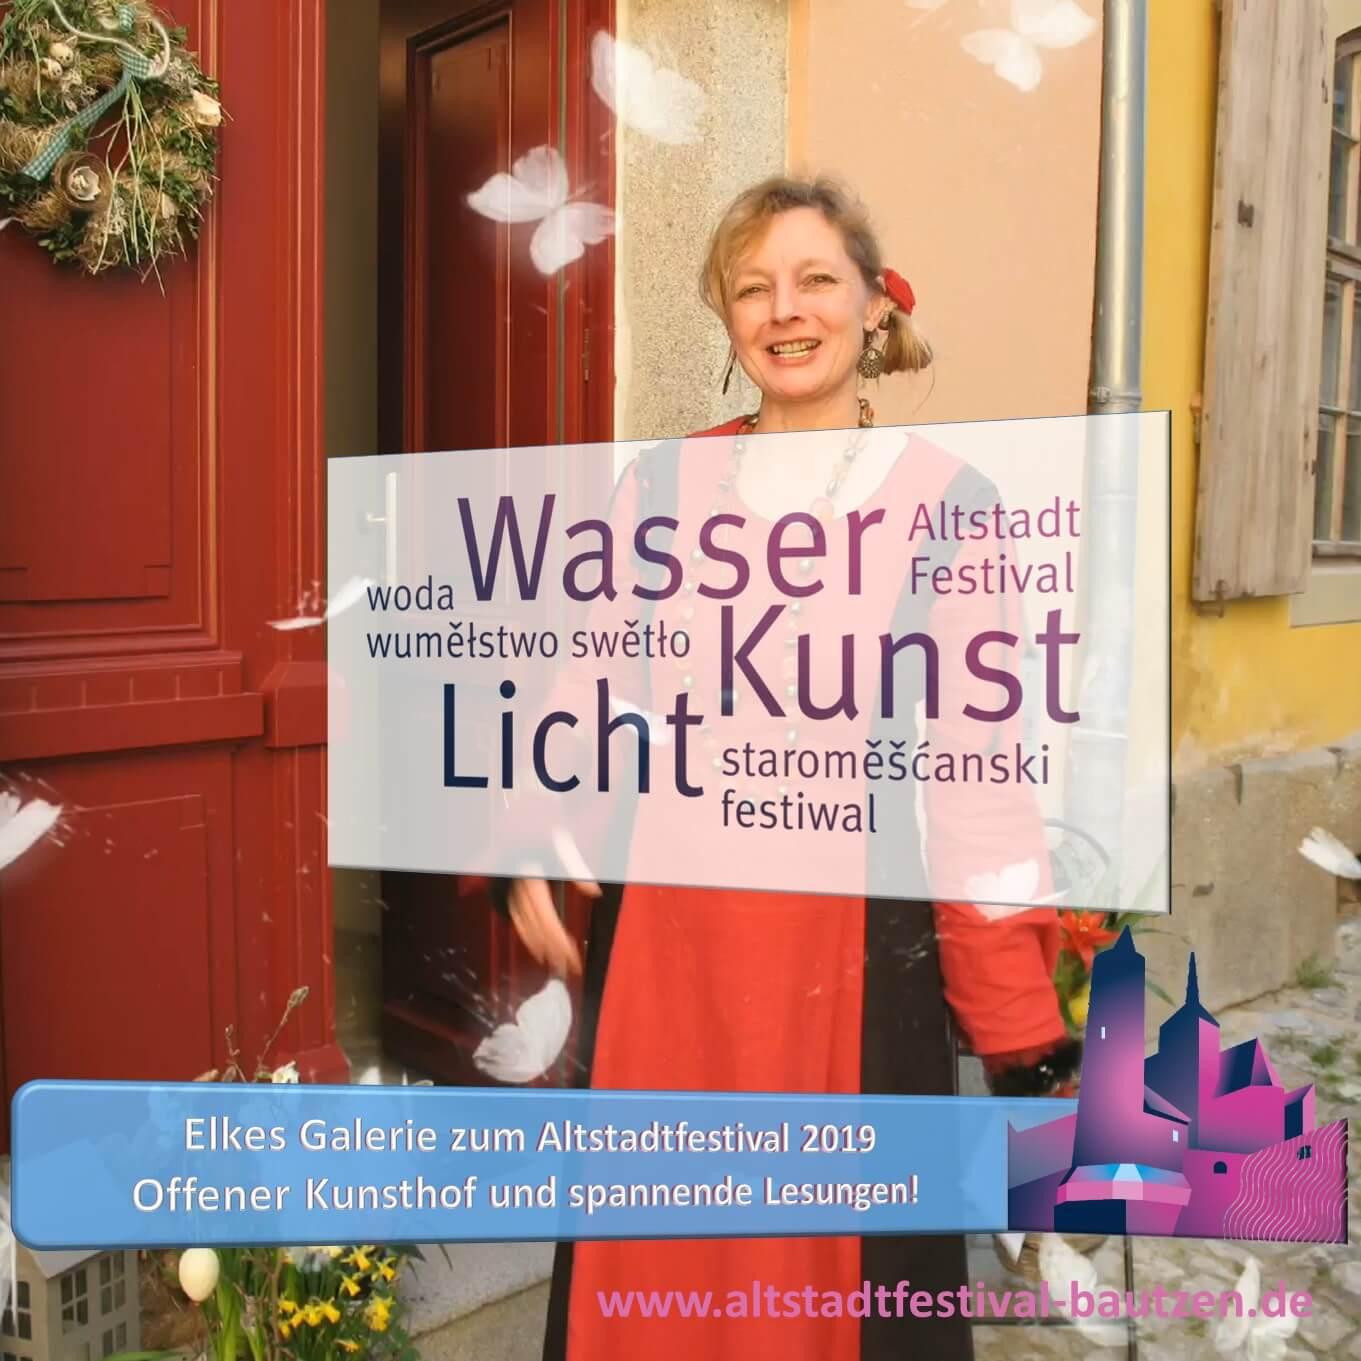 Beitragsbild Elkes Galerie zum Altstadtfestival 2019